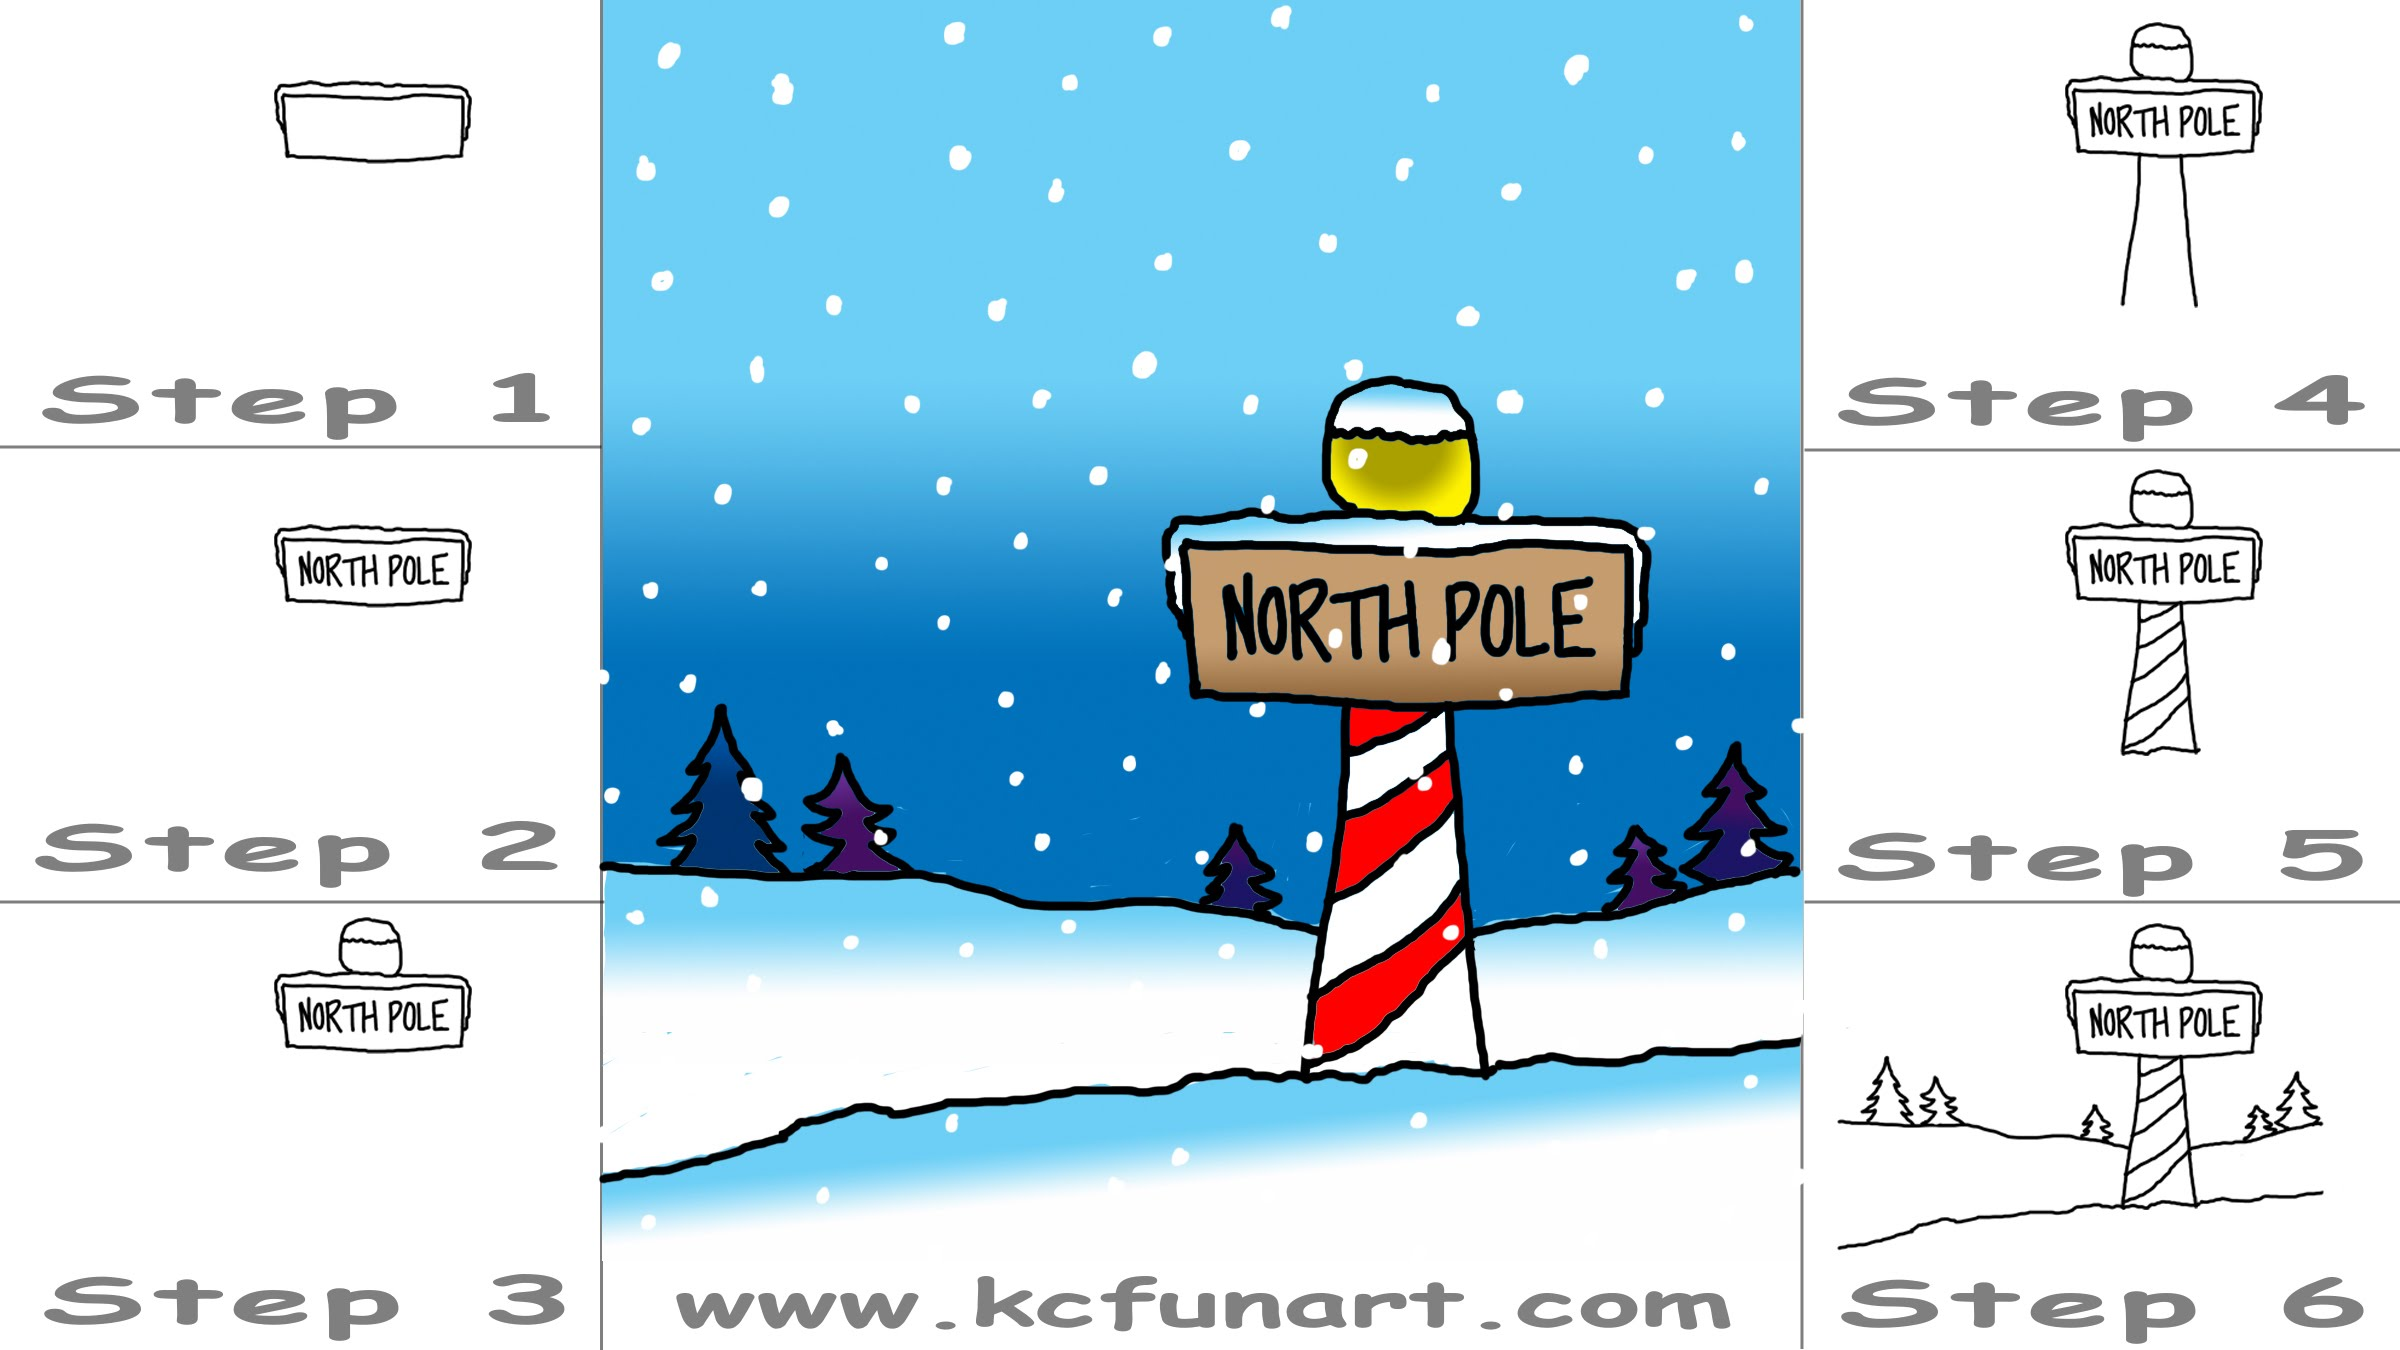 2400x1350 80 How To Draw A Cartoon North Pole